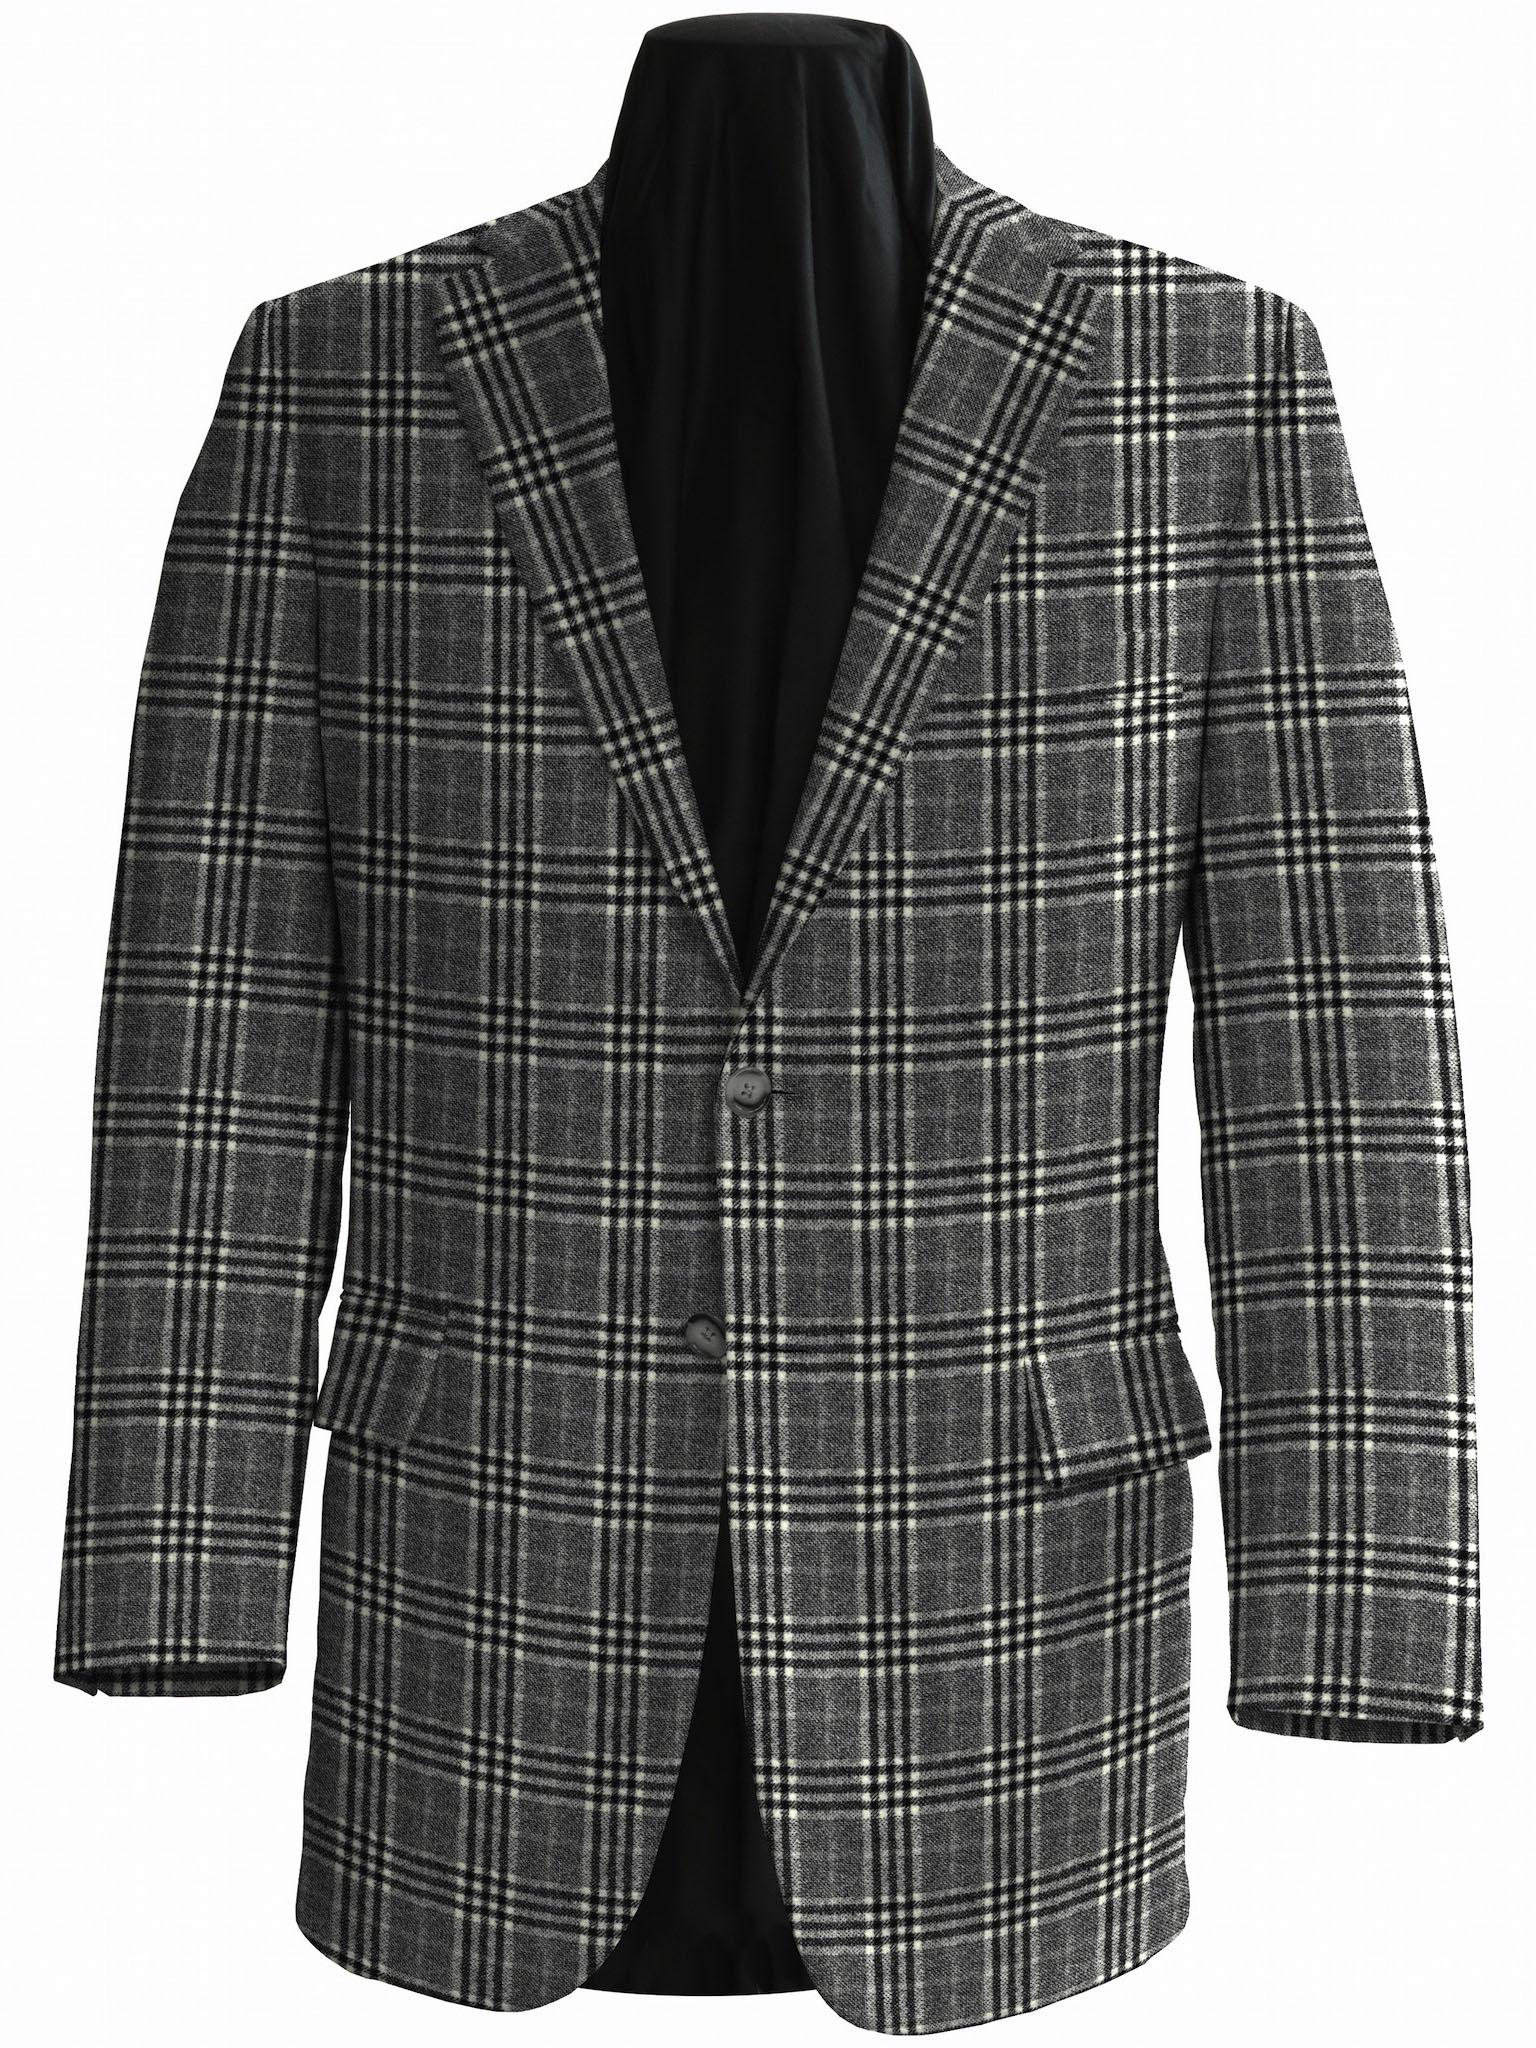 Sherry Kash Jackets Ltd Edition 904023